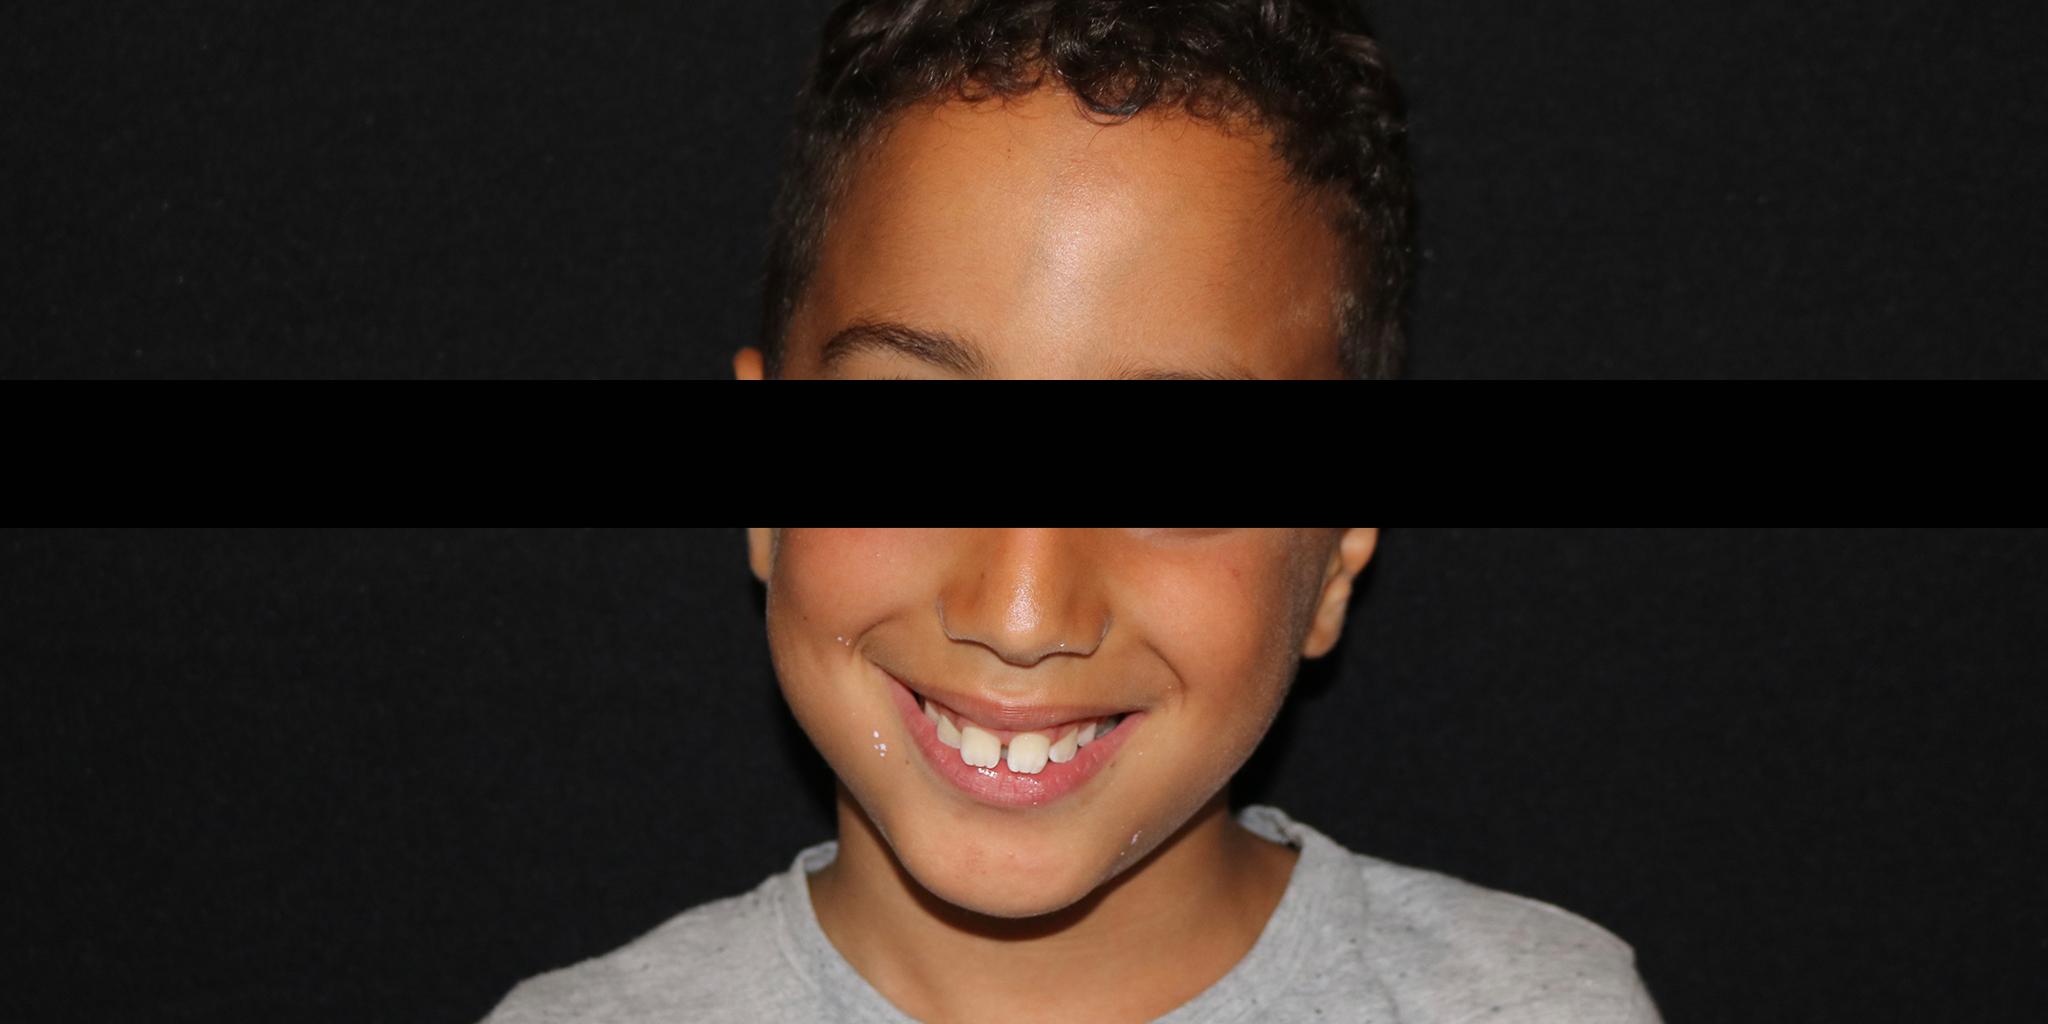 Before-Ortodontia removível